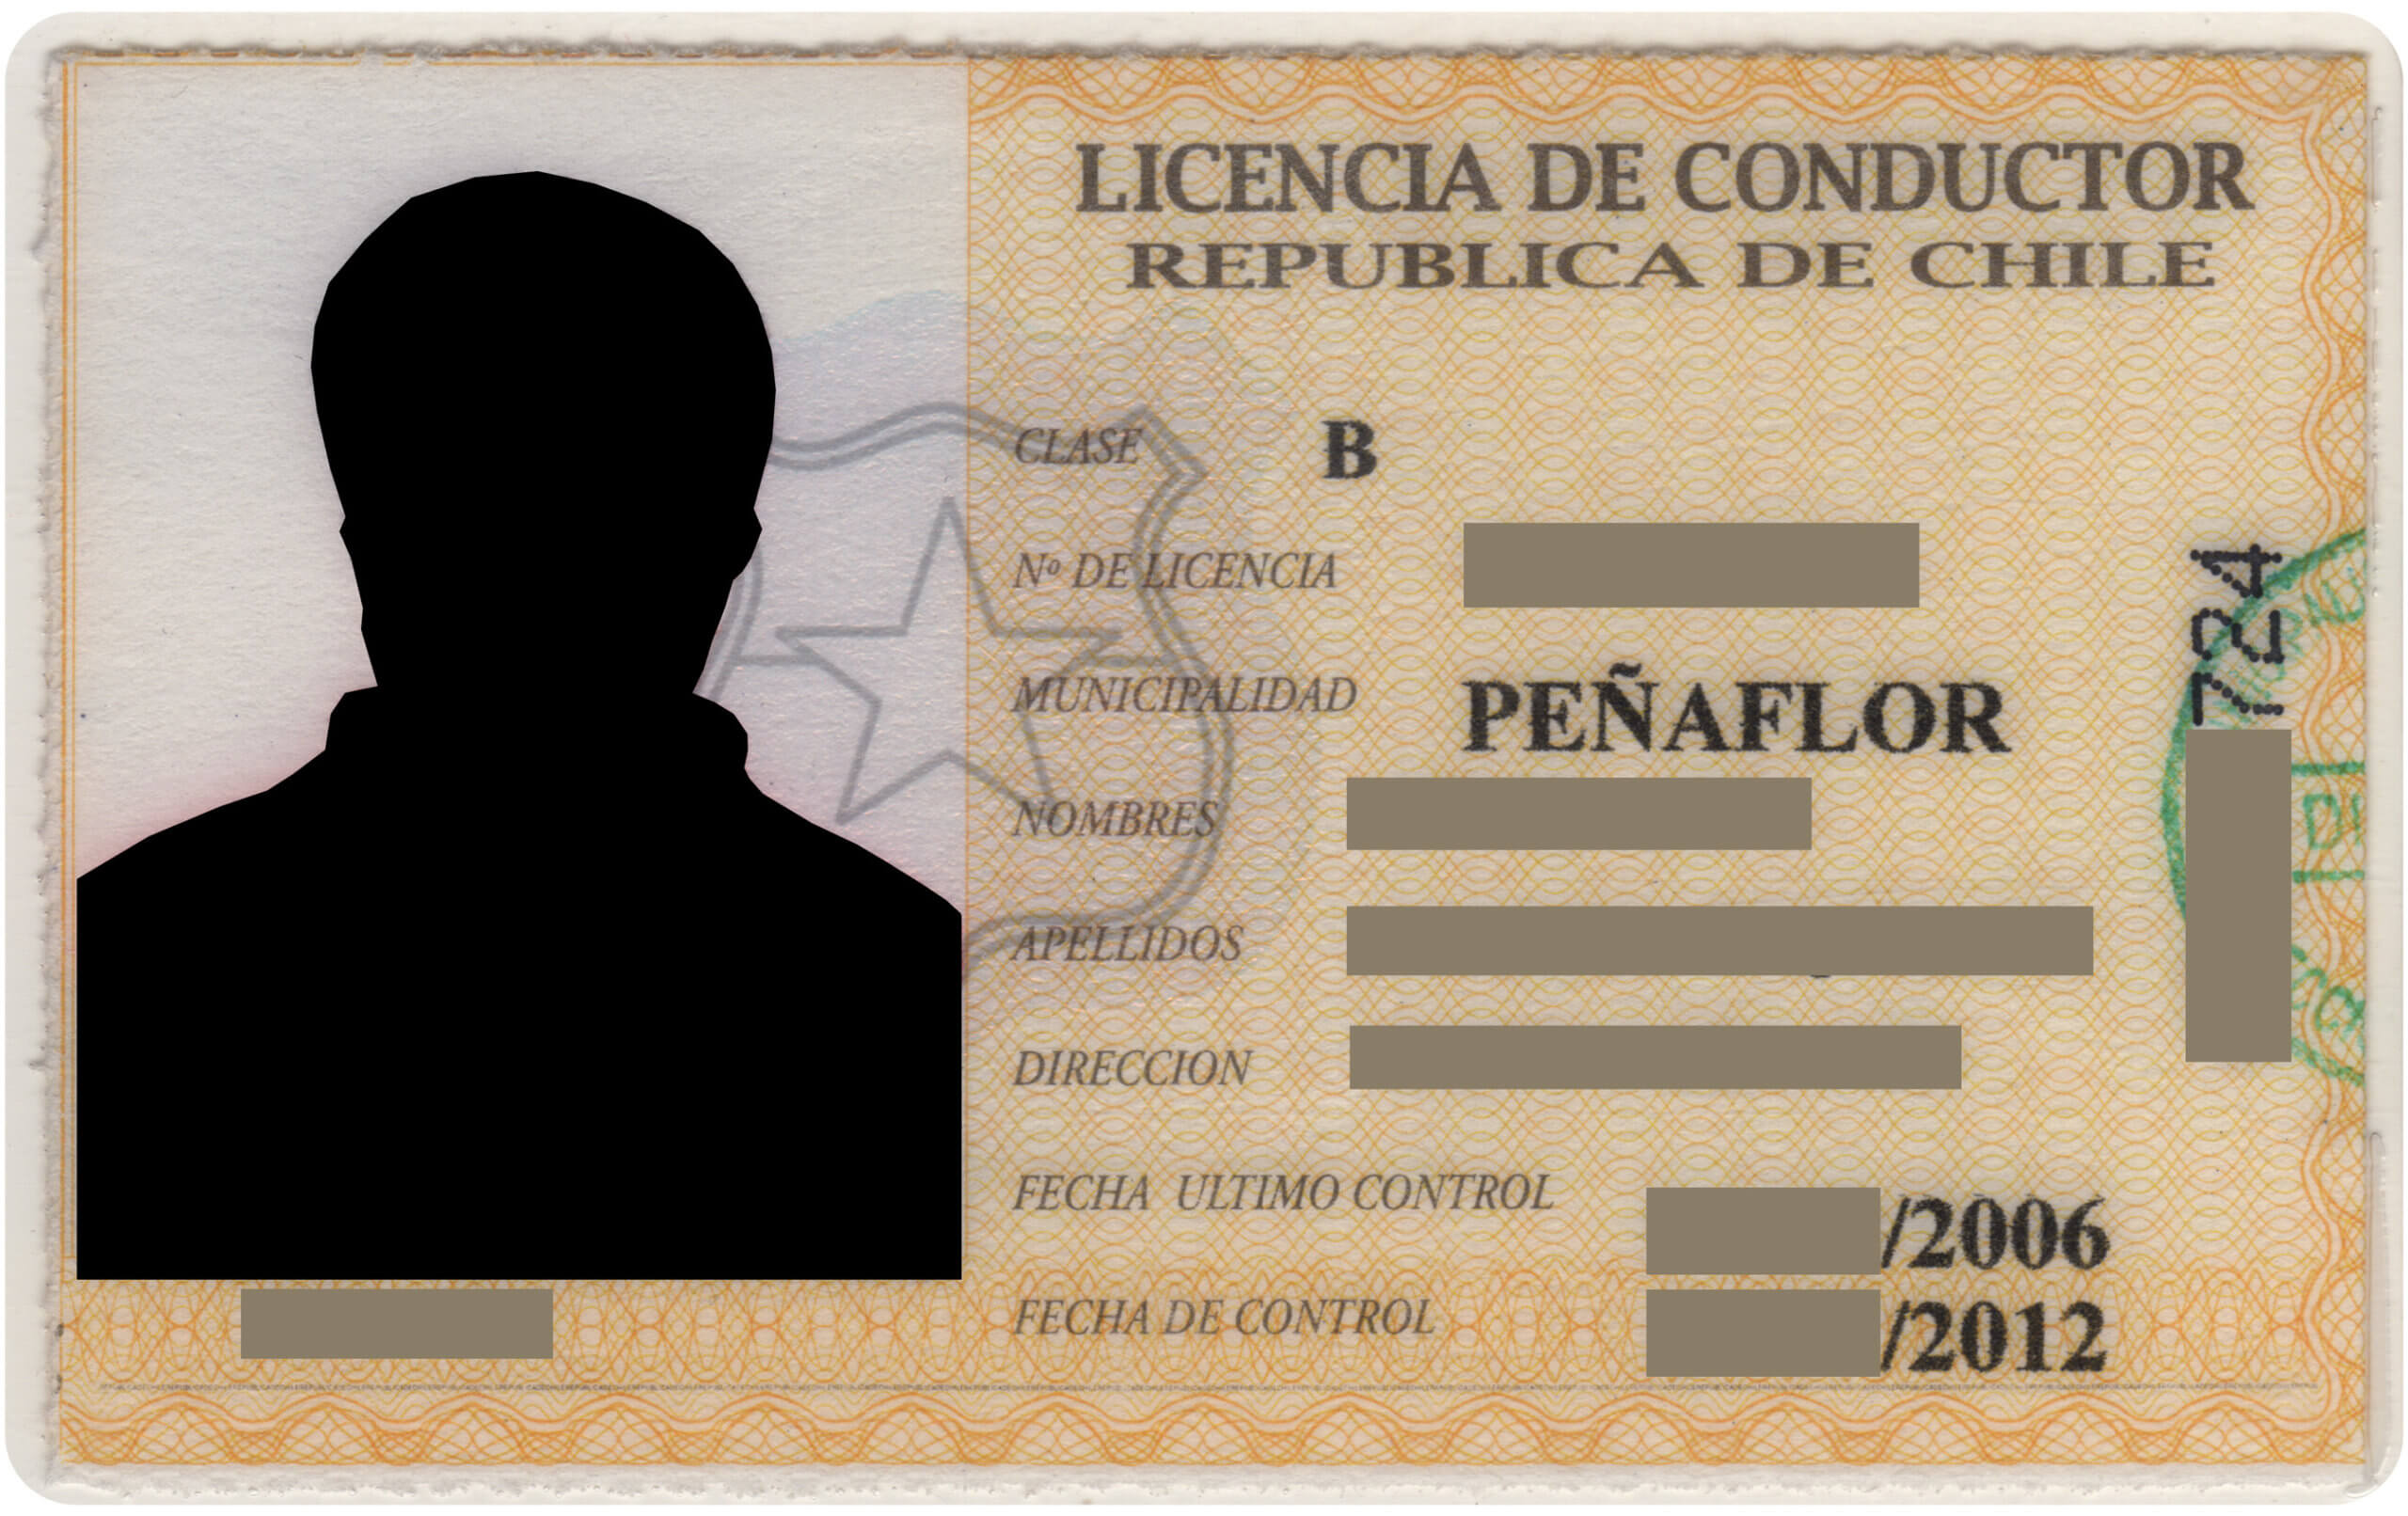 Carnet conducir Chile